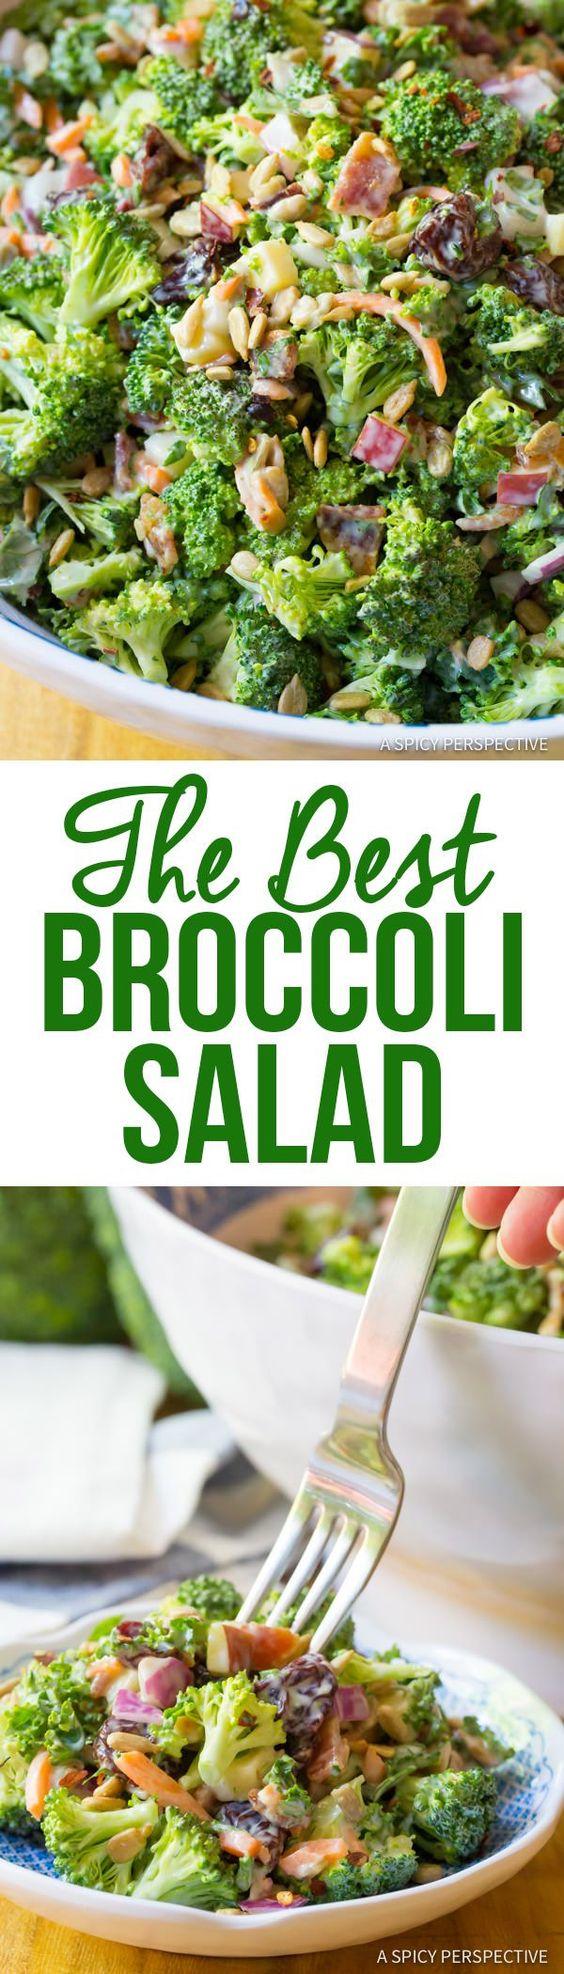 Best broccoli salad recipe, Broccoli salad recipes and Broccoli salads ...